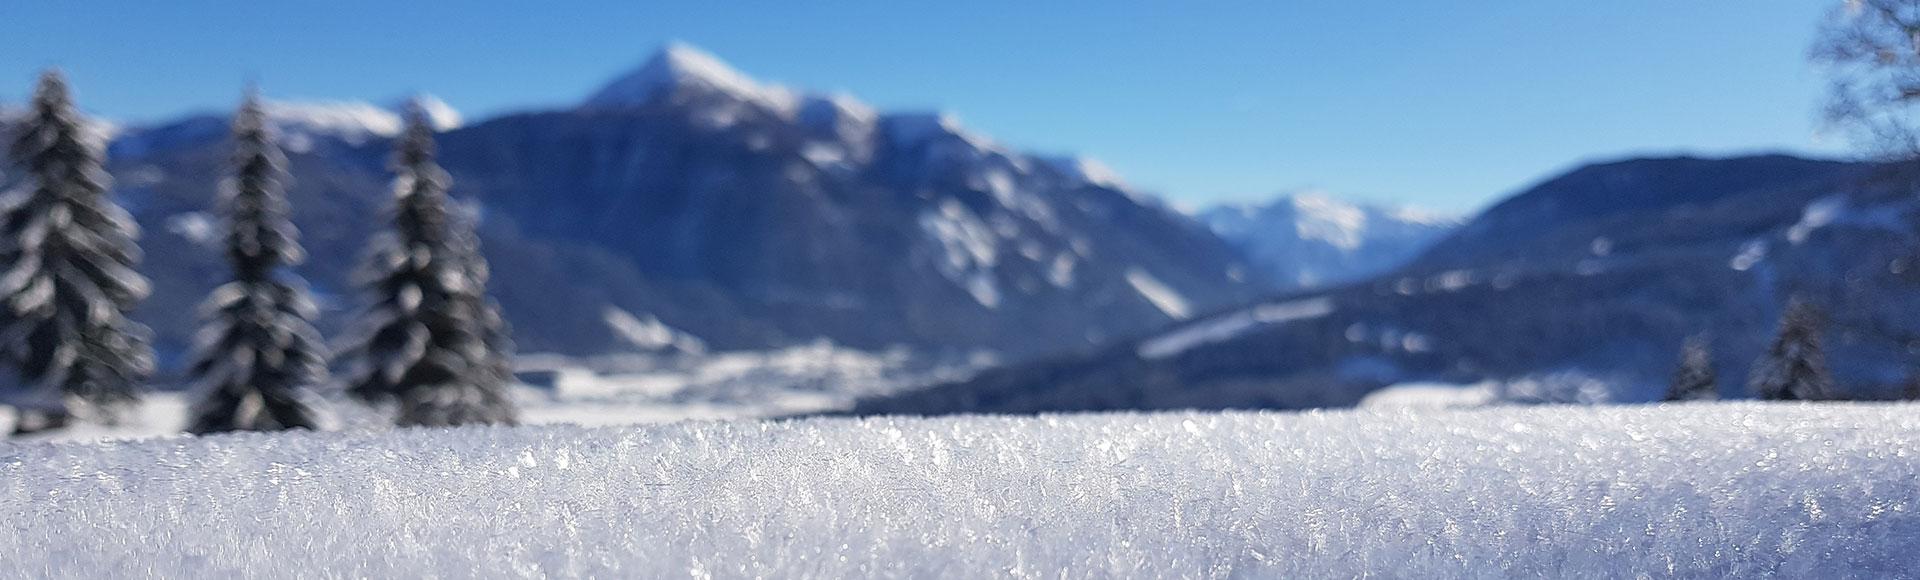 Winter Special im Hotel Alpenwelt in Flachau